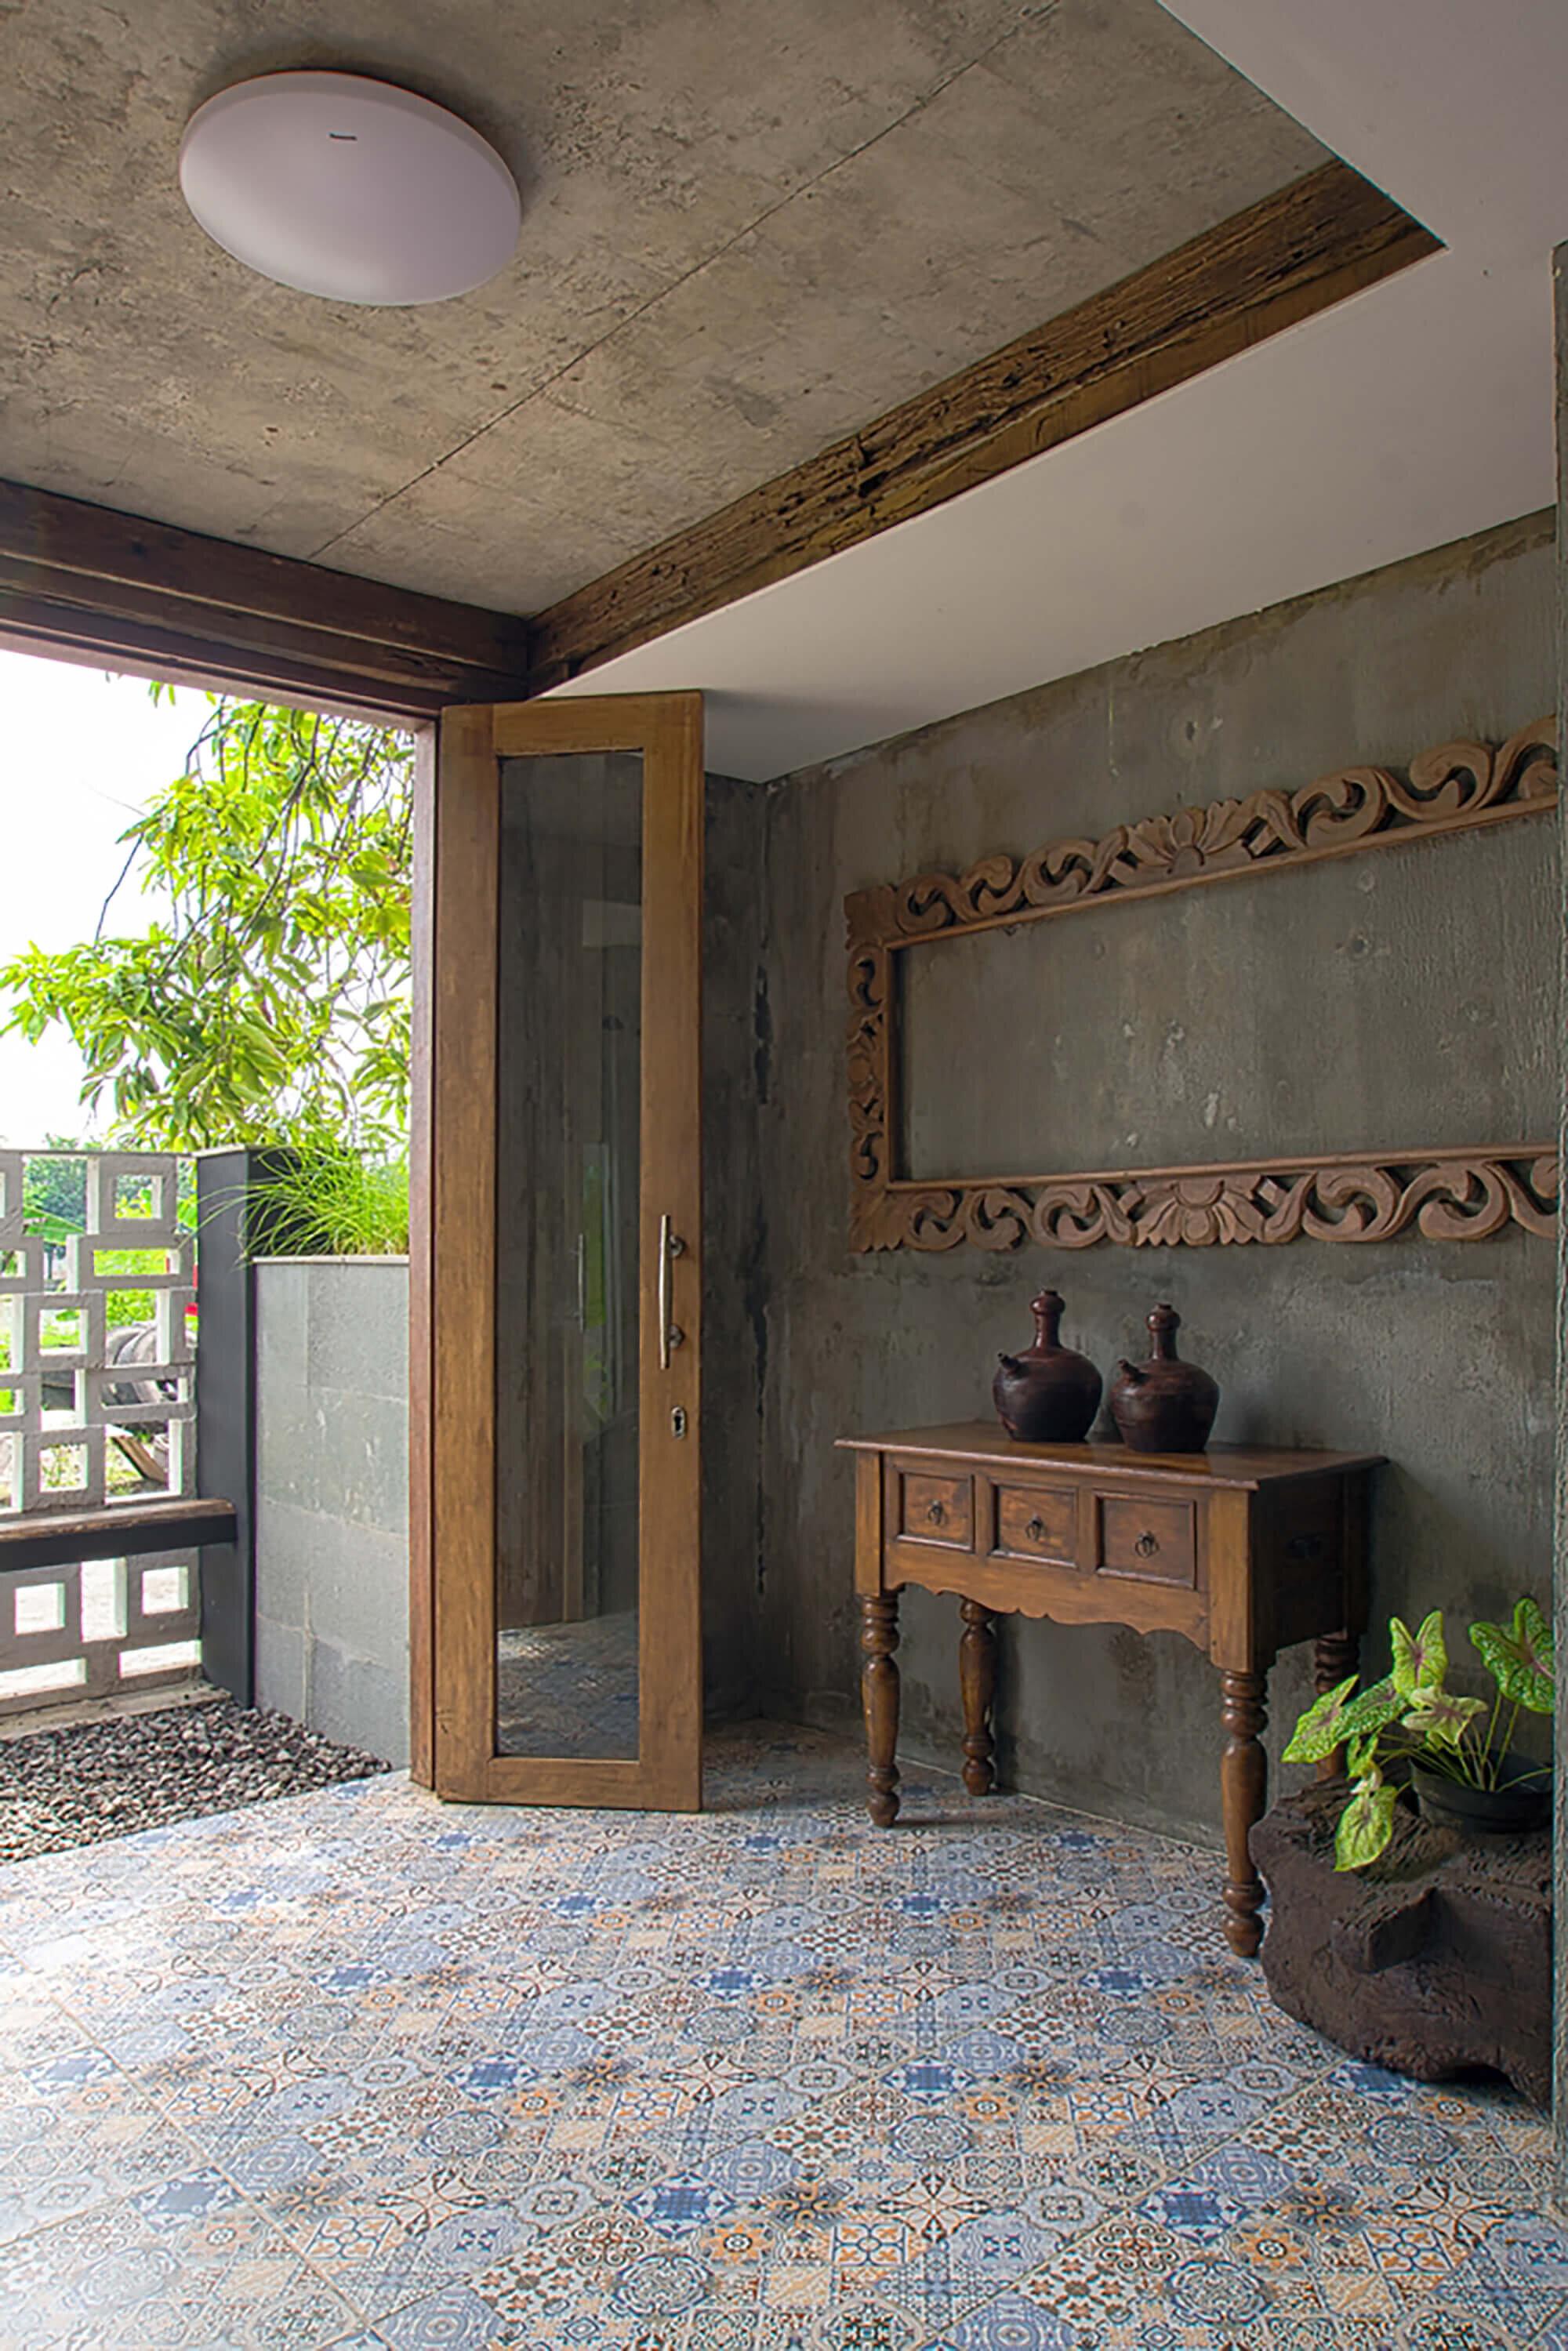 The-Obsolete-House-Omah-Amoh-Gayuh-Budi-Utomo-Indonesia-4